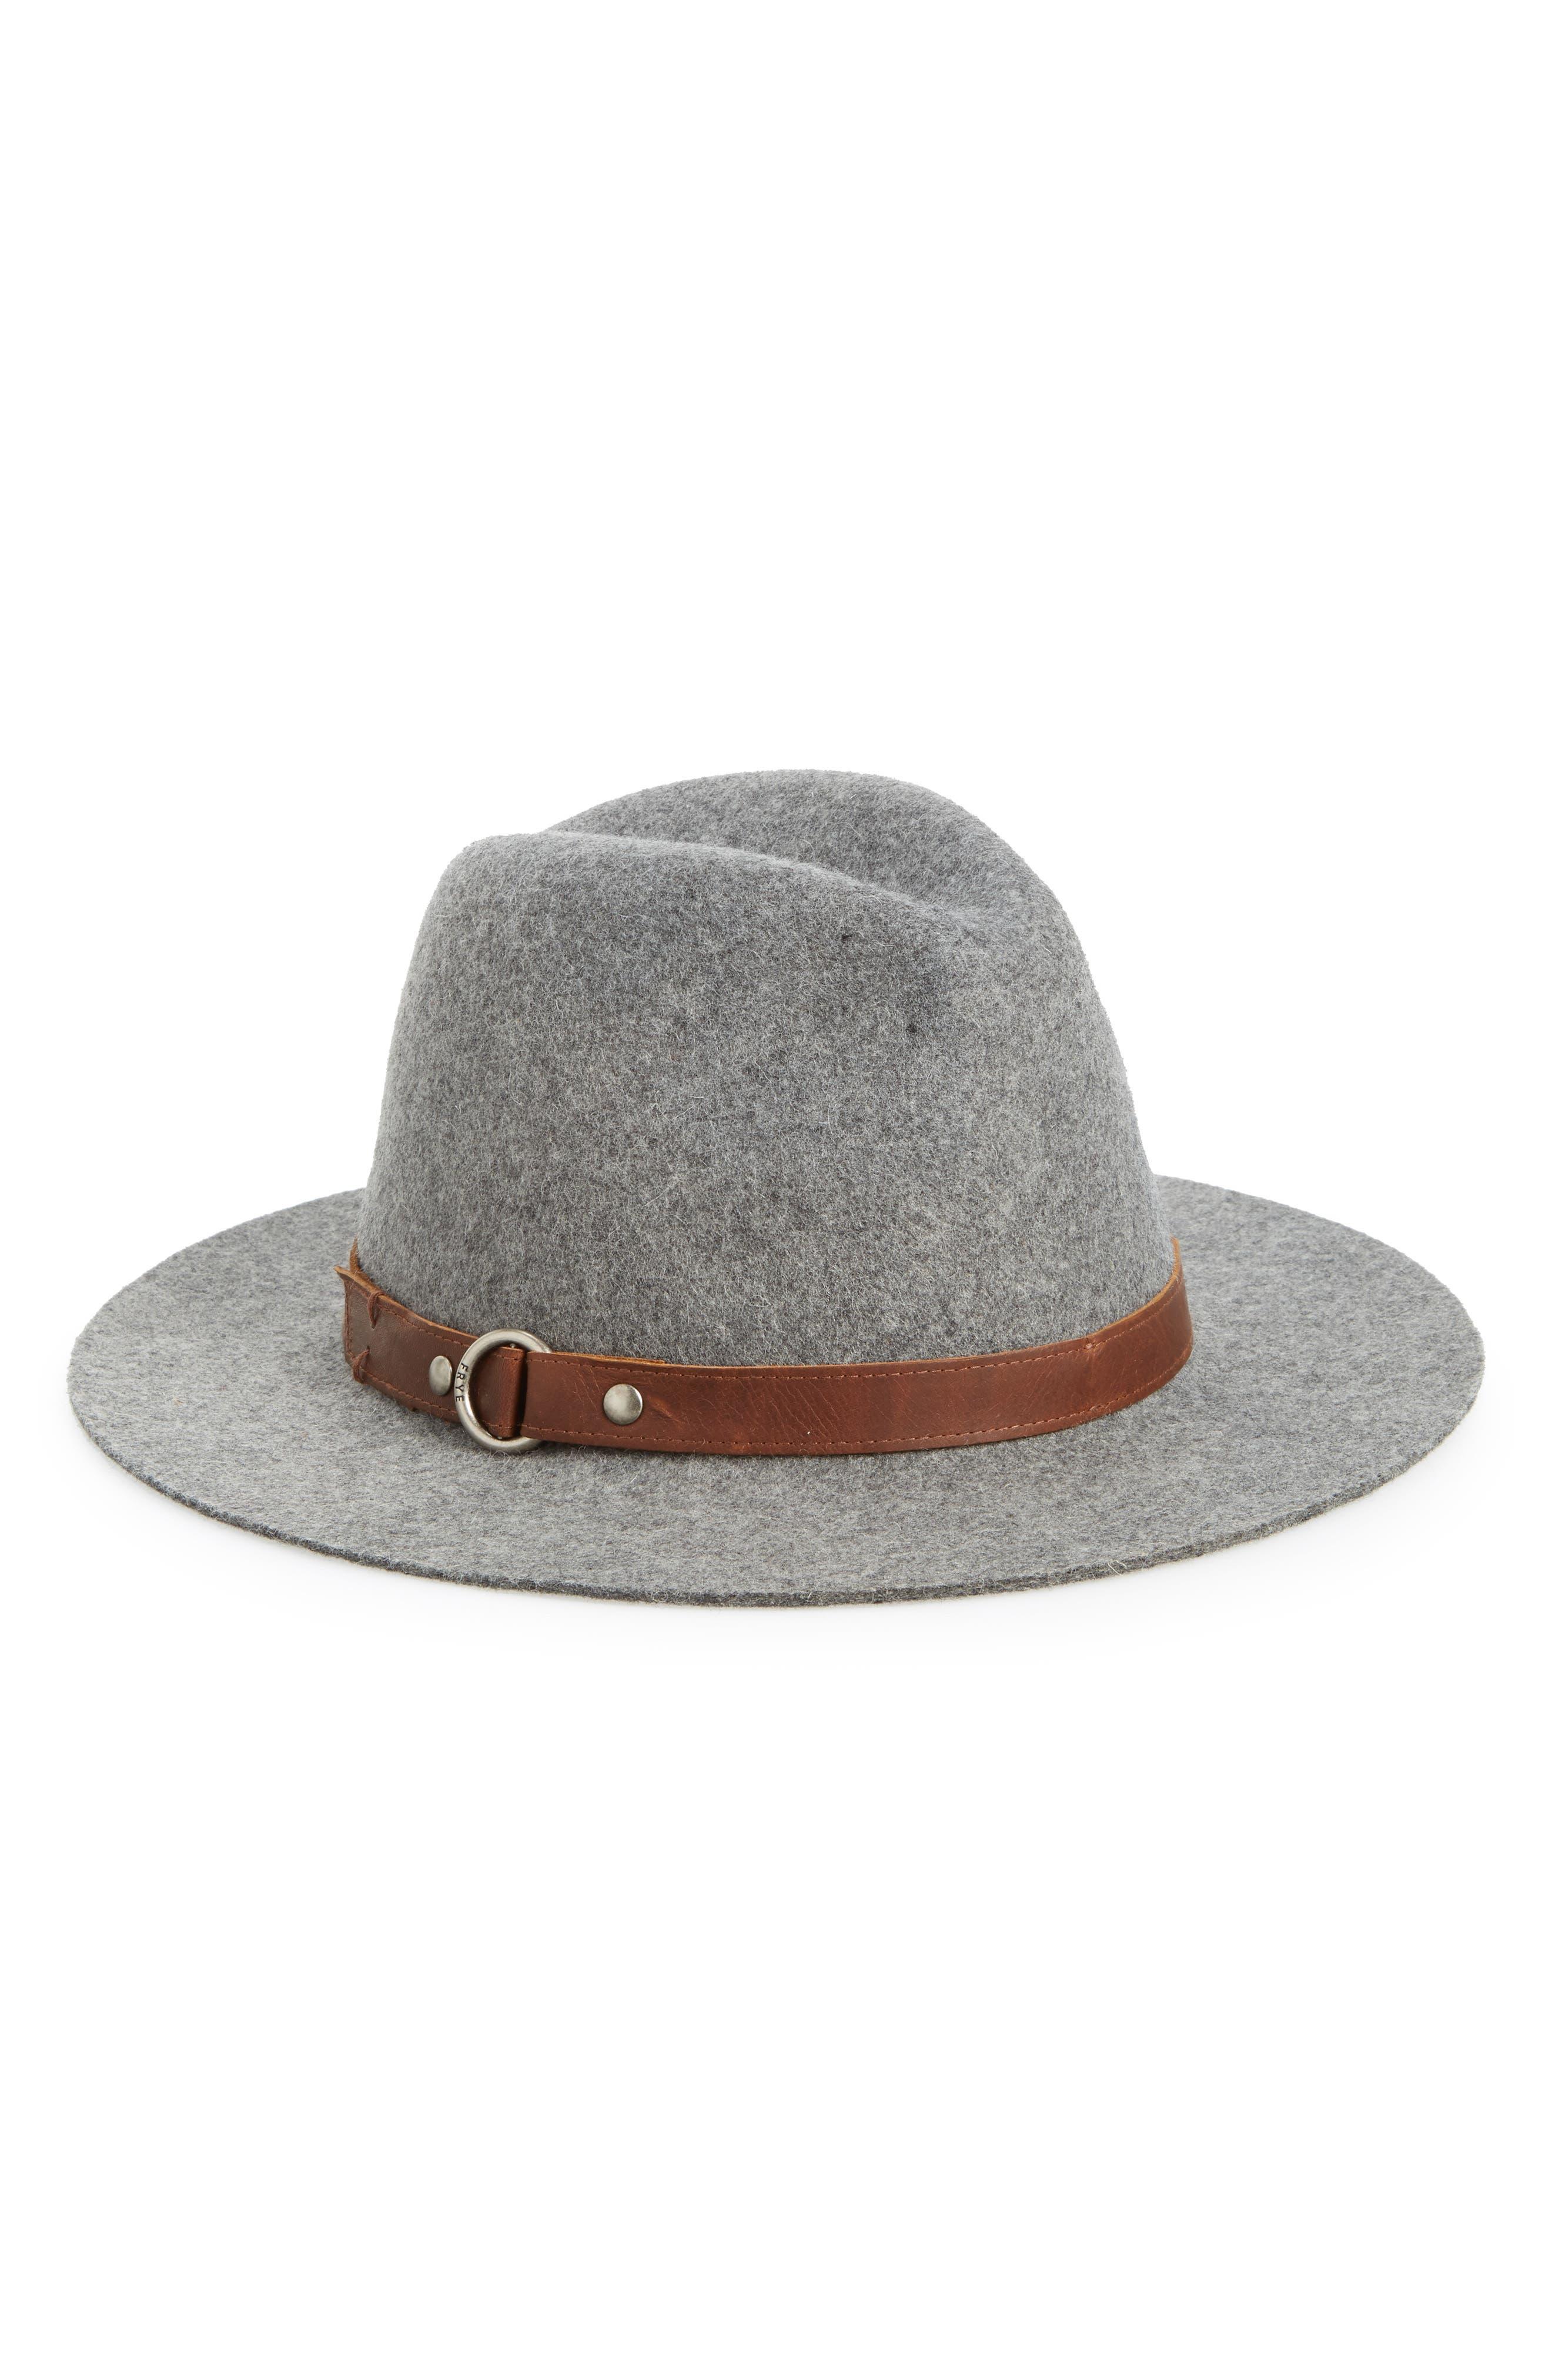 Harness Wool Felt Panama Hat,                             Main thumbnail 1, color,                             GRAY